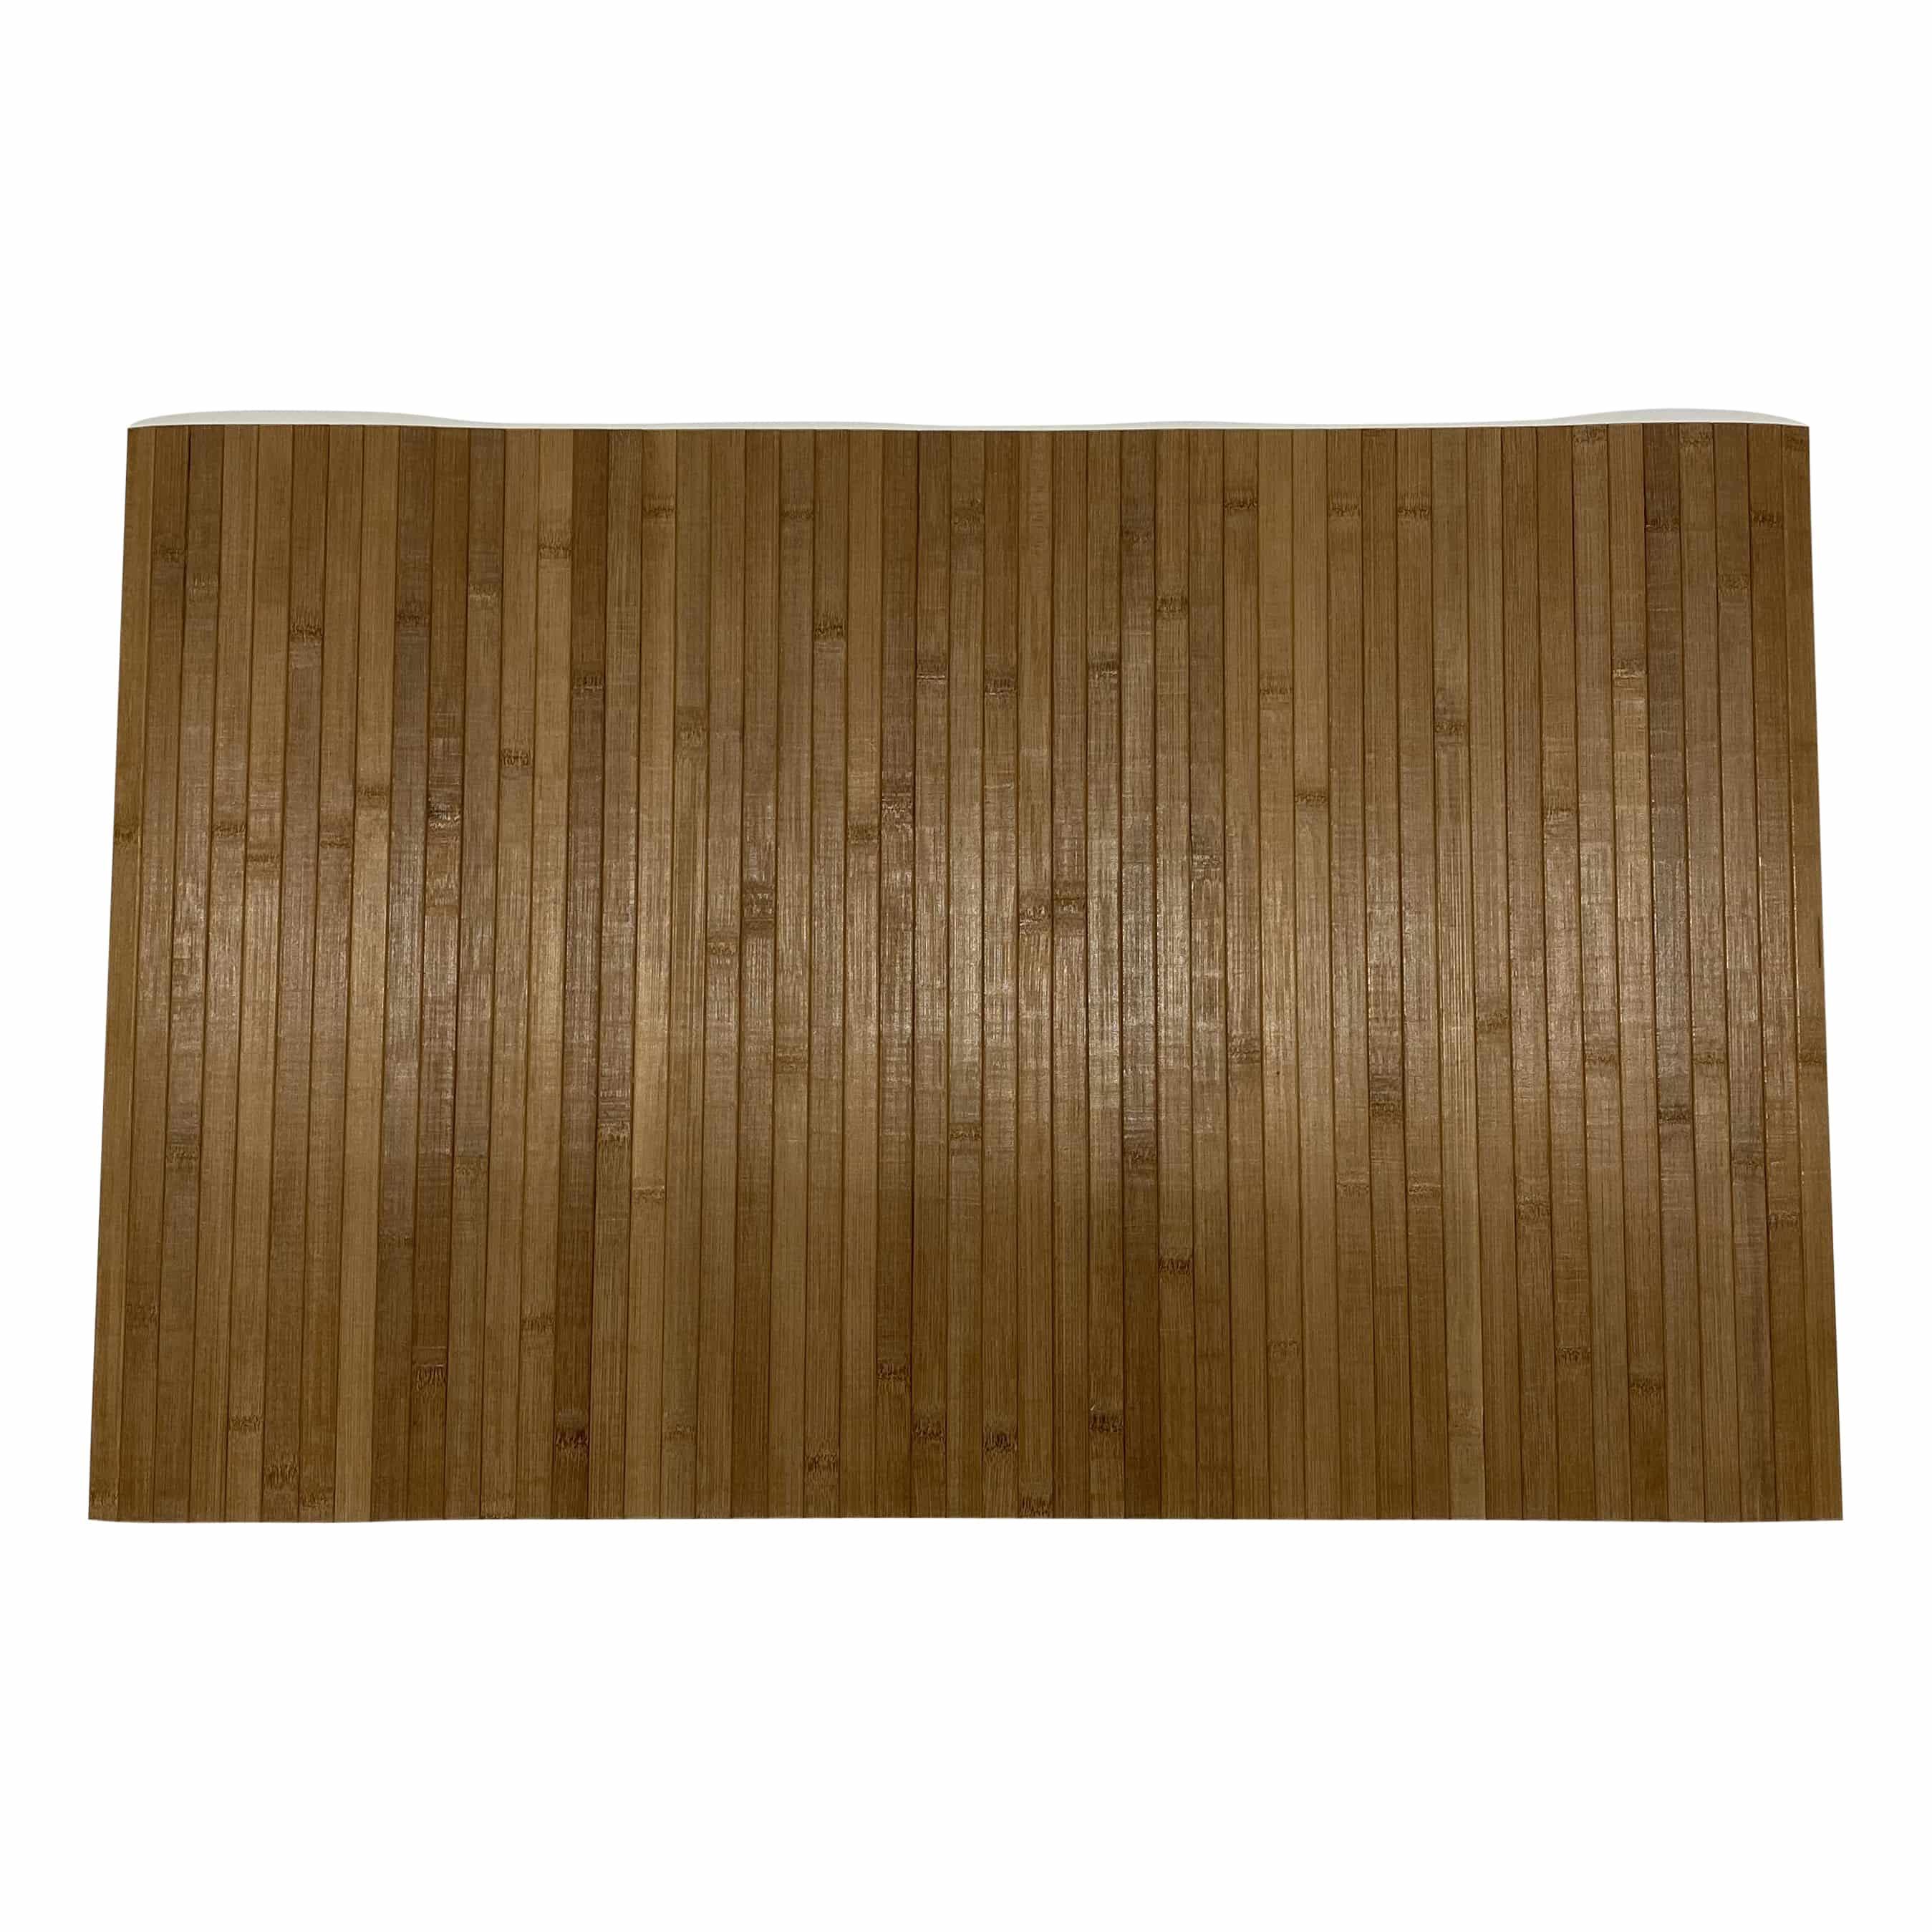 4goodz bamboe anti-slip douchemat-badmat 50x80 cm - Lichtbruin